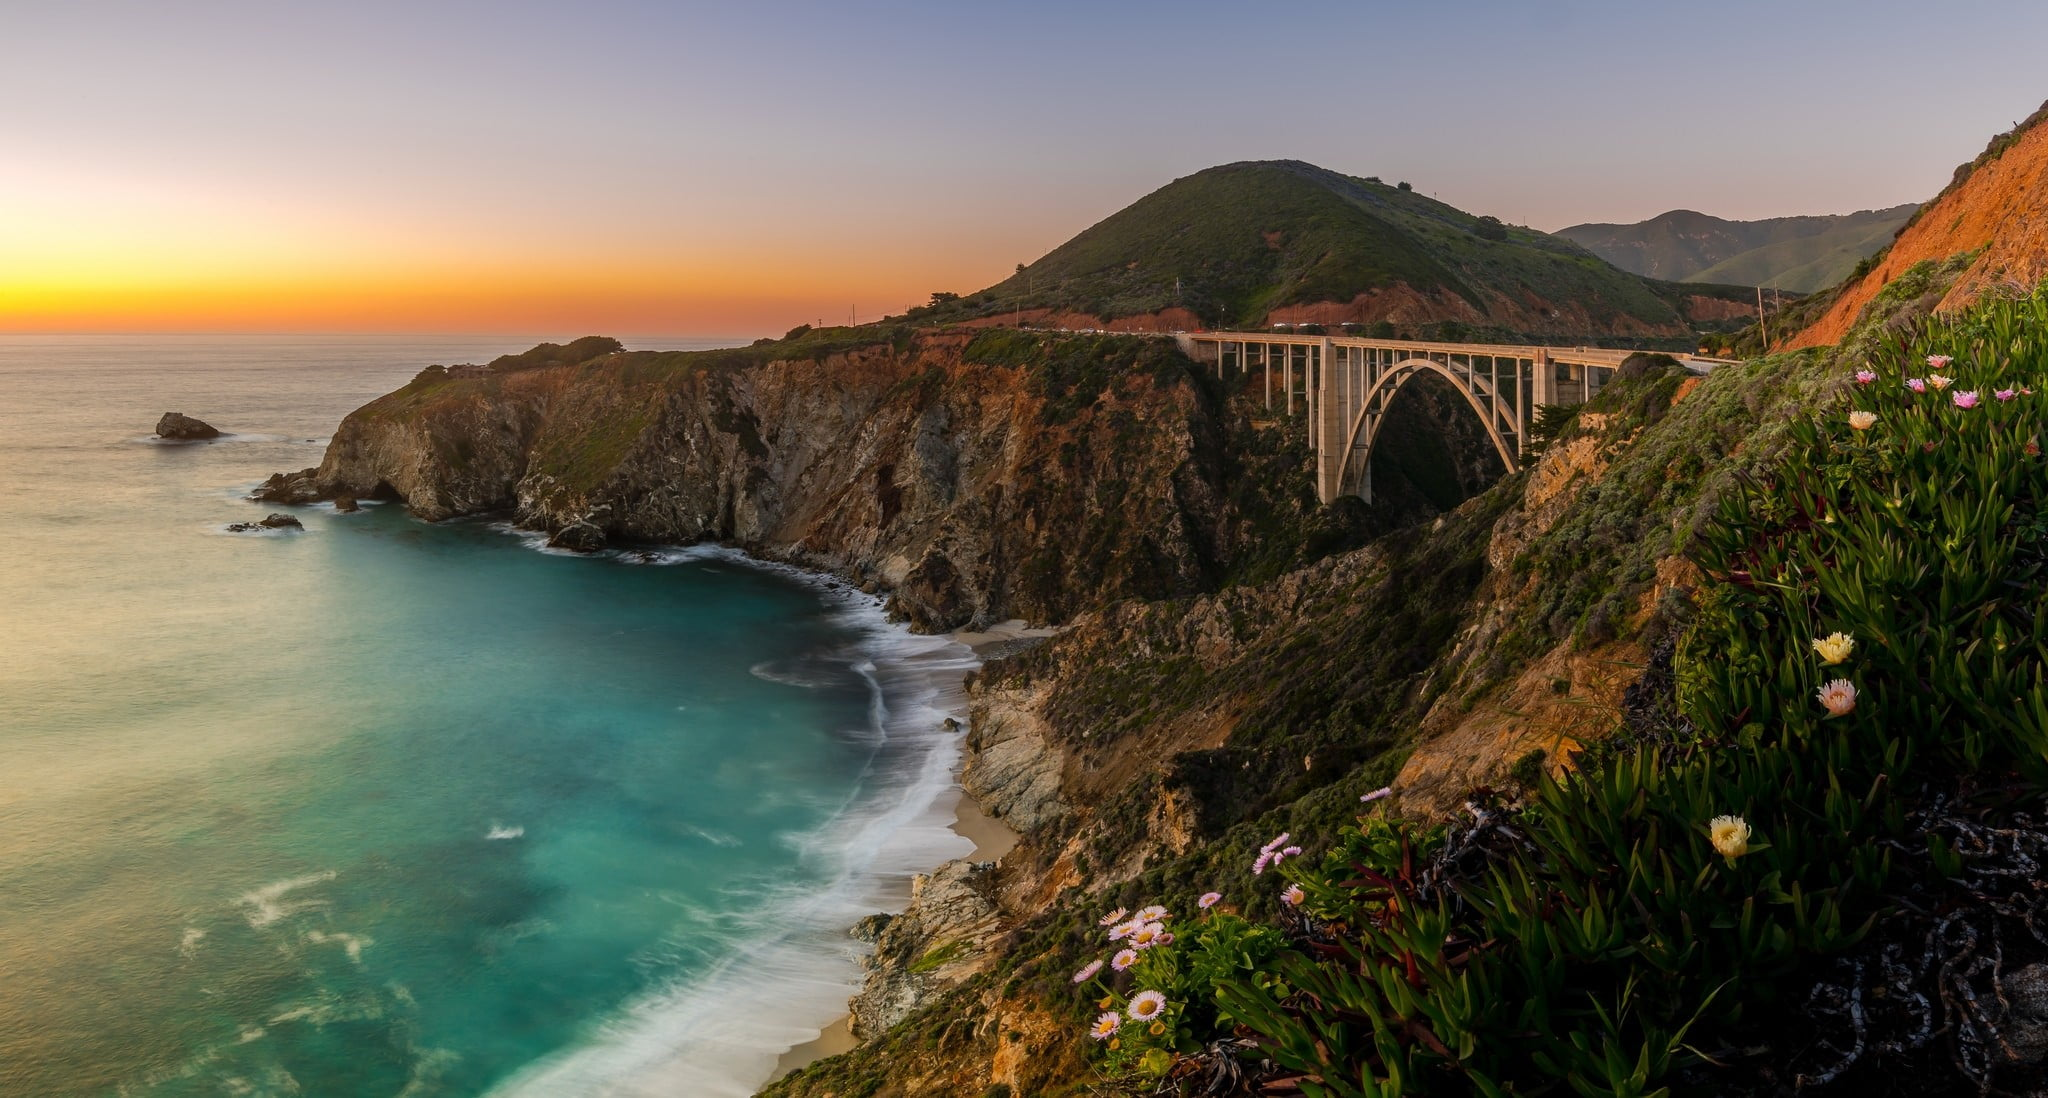 photography-nature-landscape-sunset-wallpaper.JPG